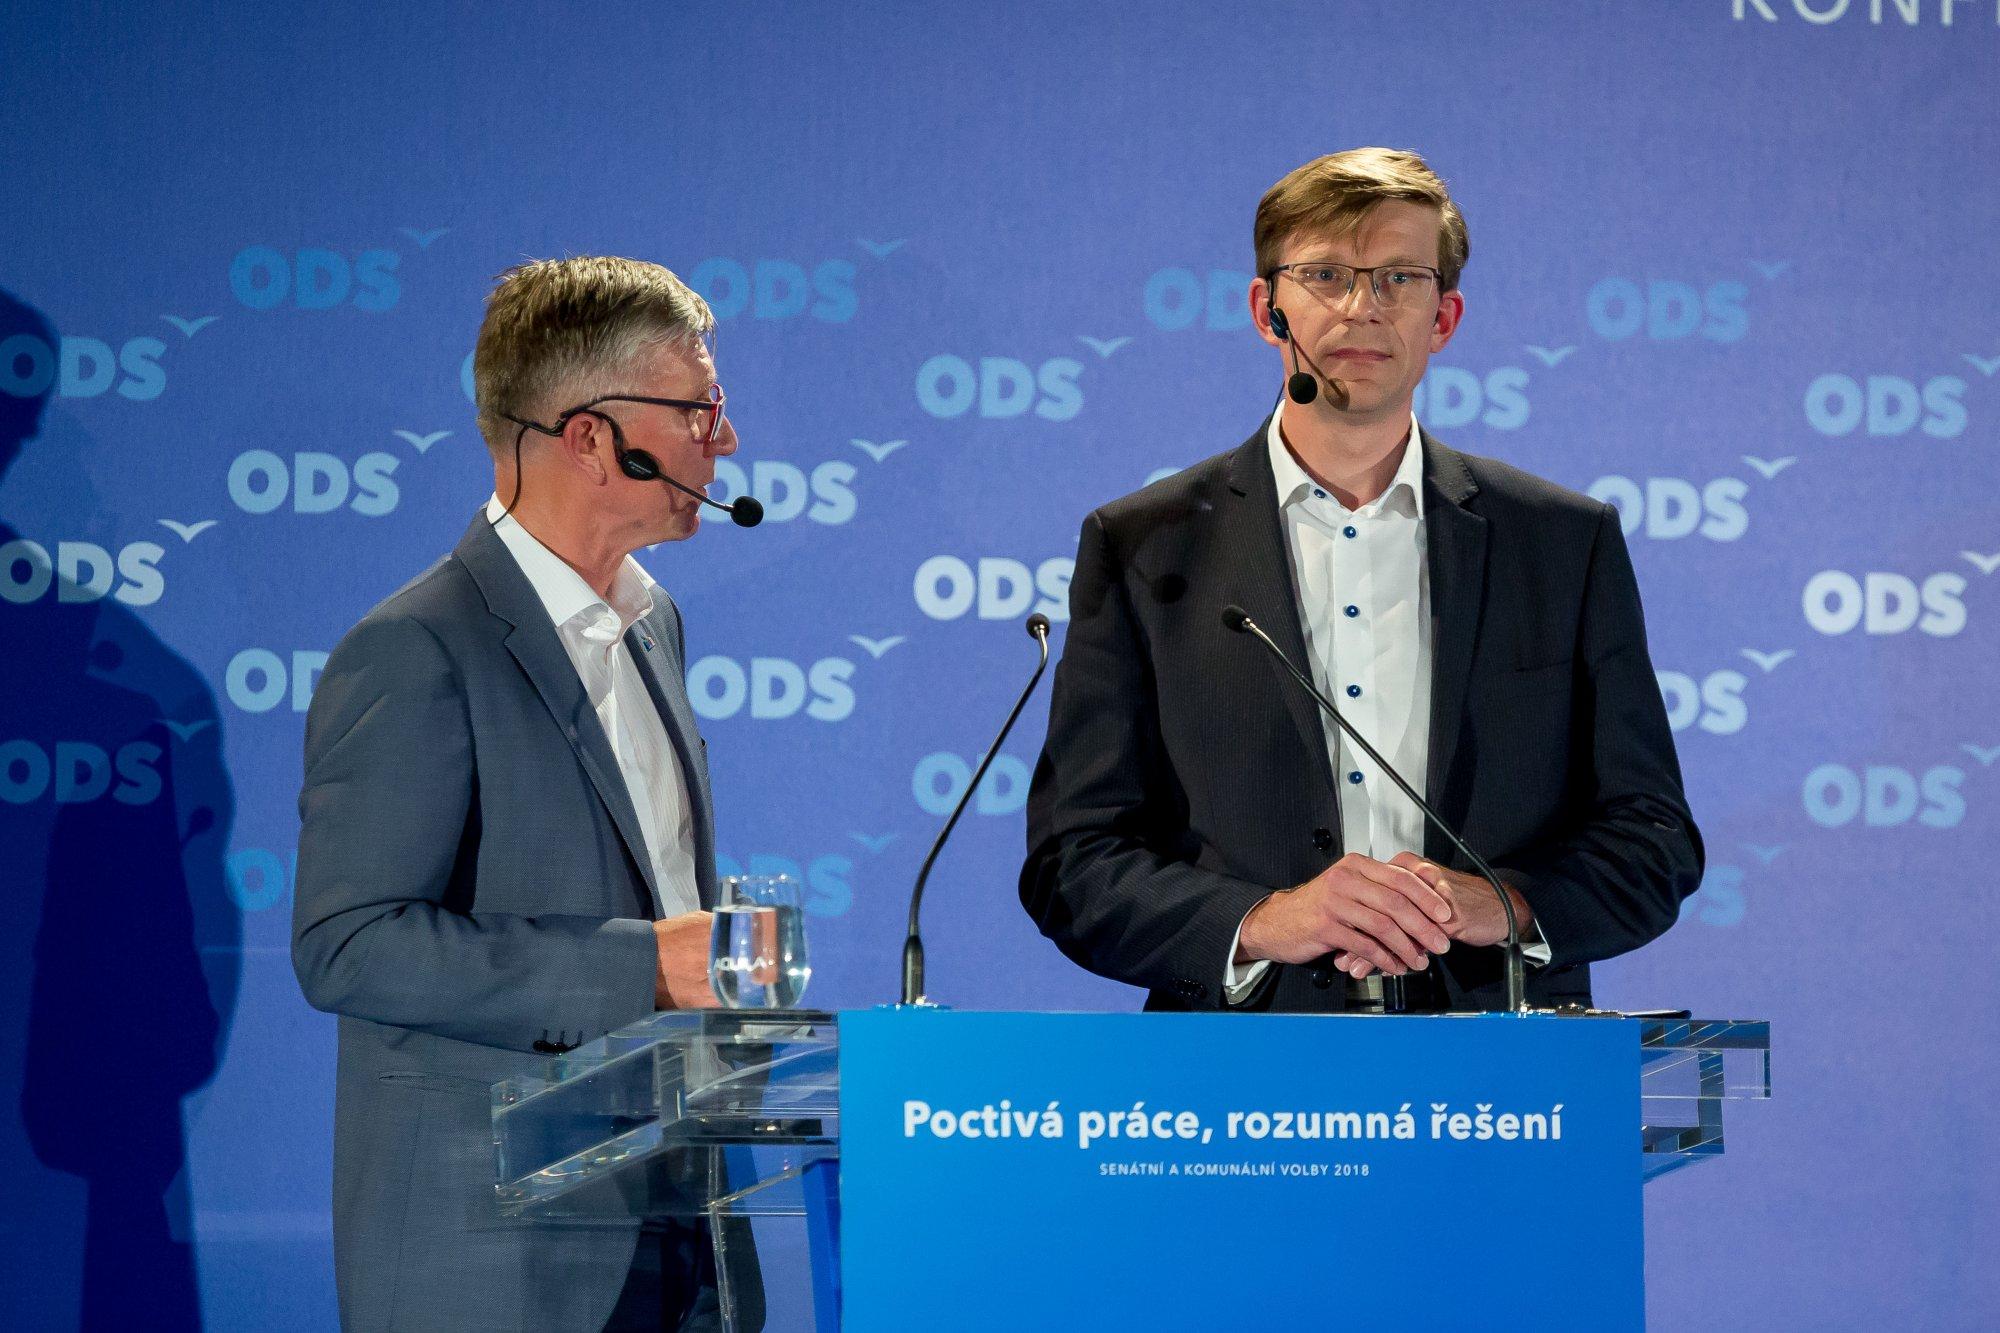 ODS urychluje digitalizaci státu i z opozice